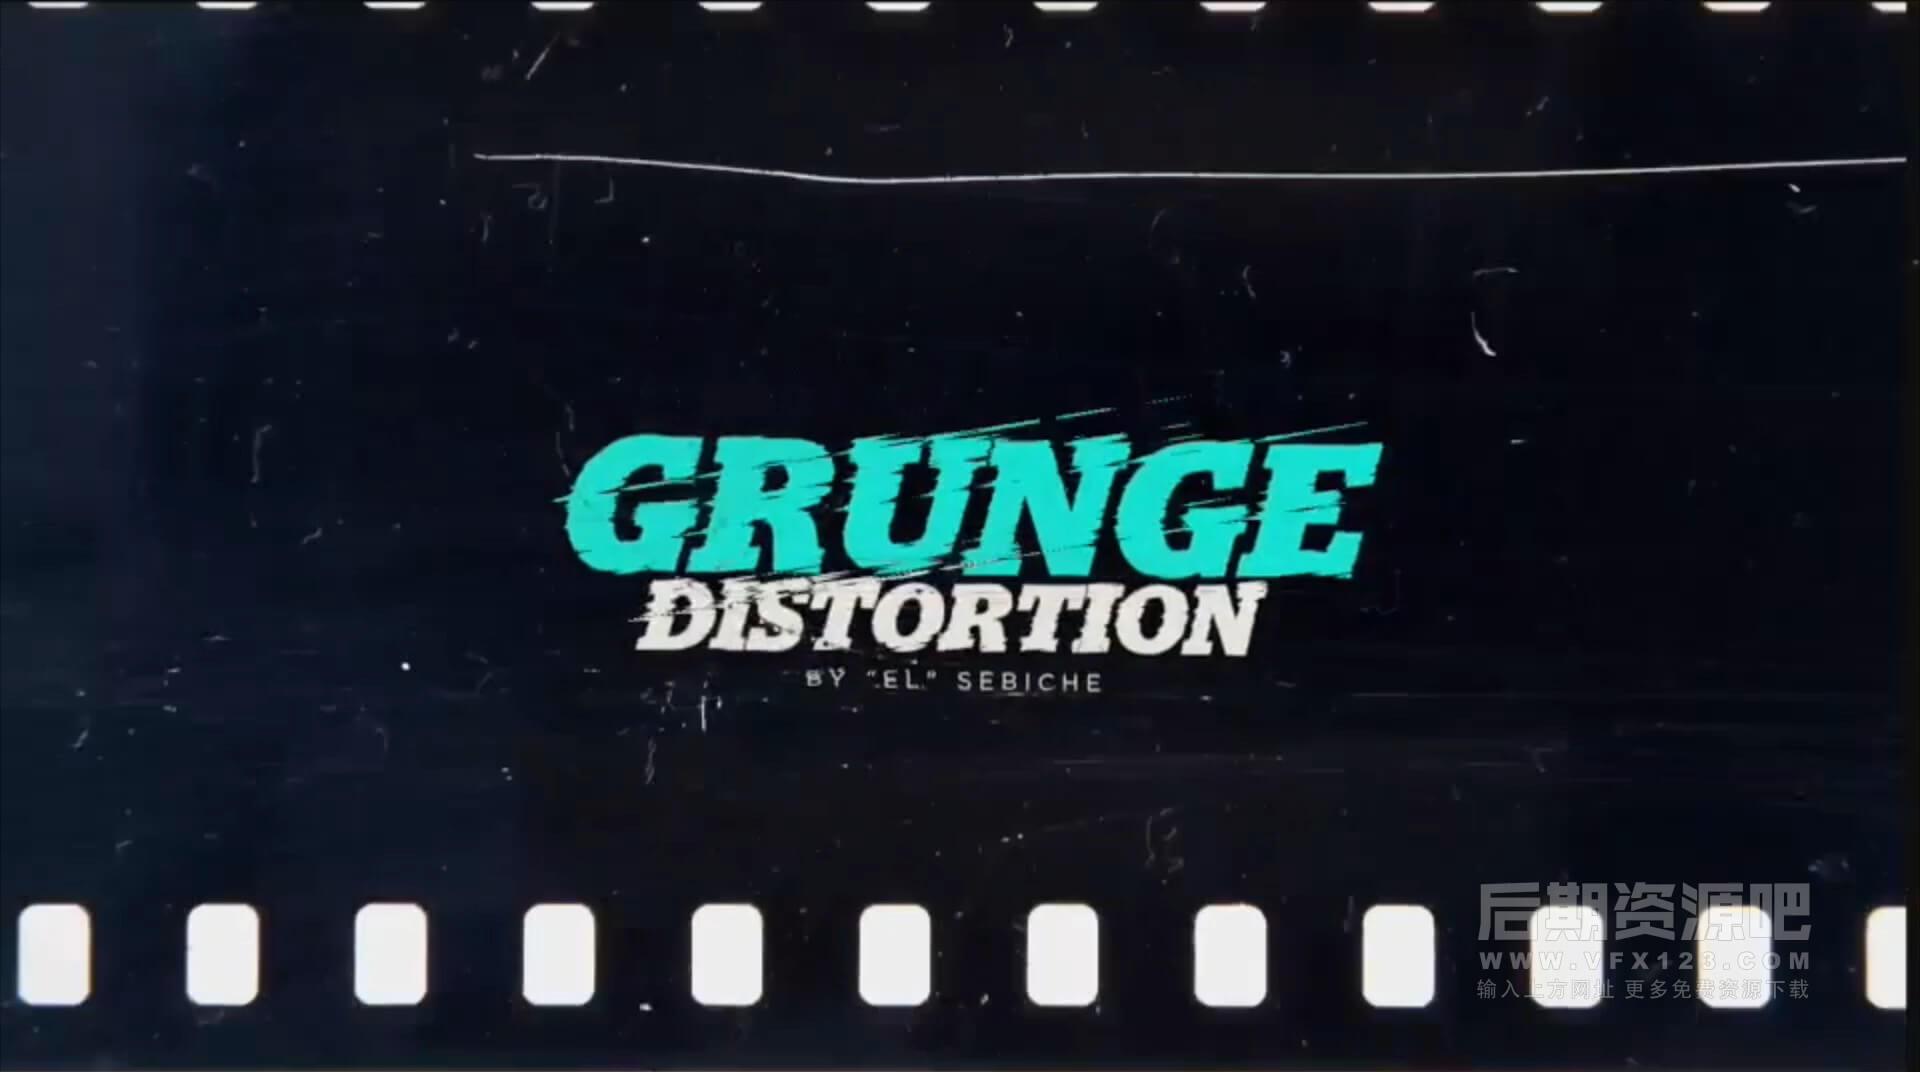 Motion模板 信号干扰划痕色彩分离效果片头展示模板 Grunge Distortion